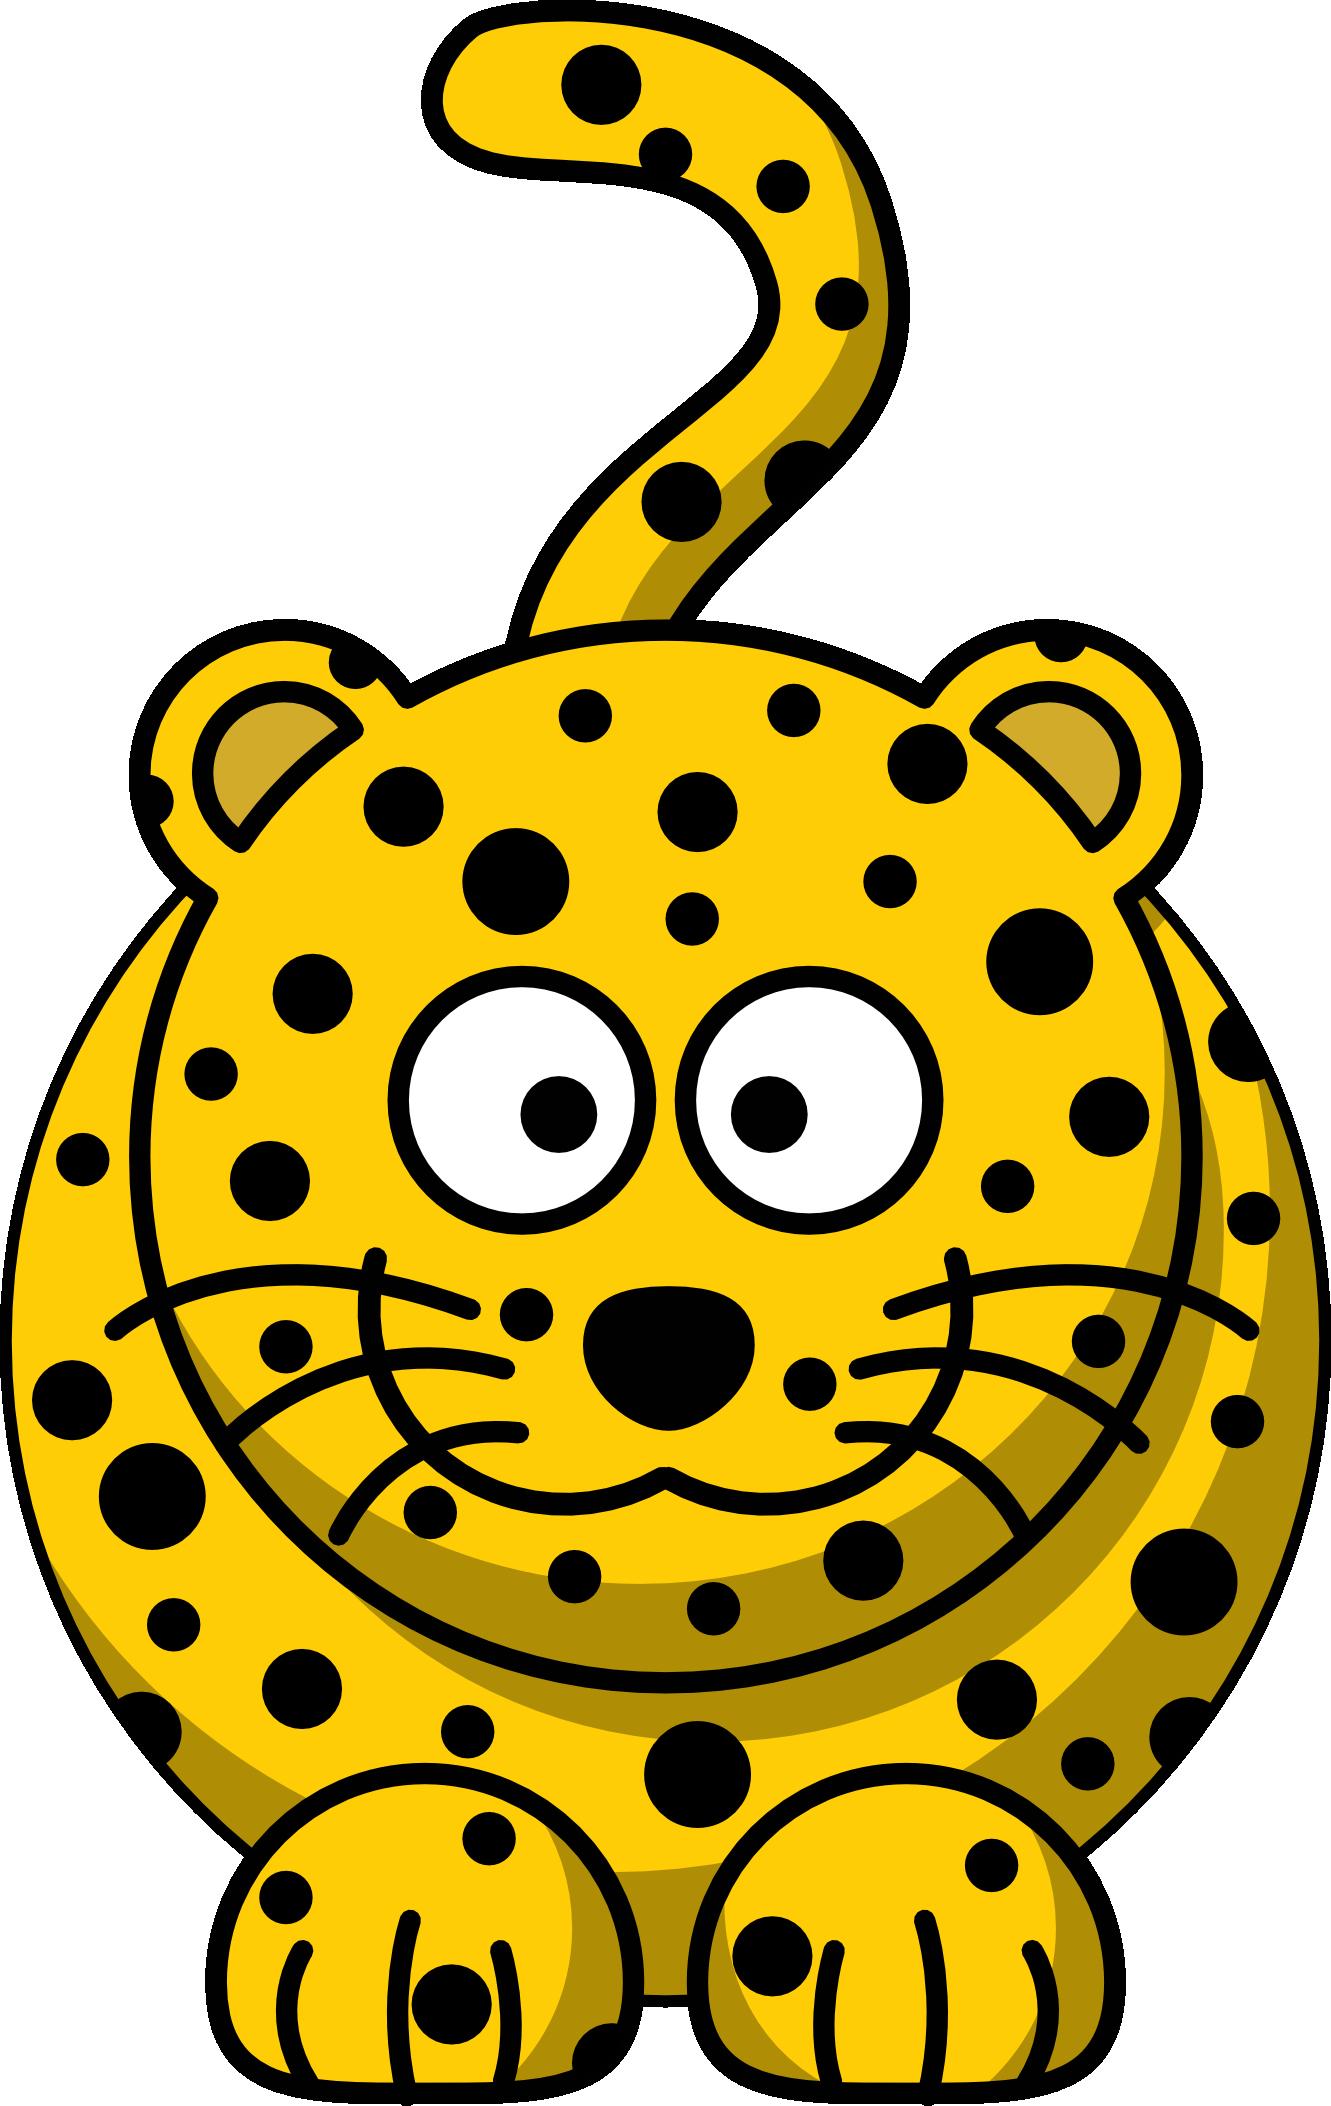 clip art cartoon leopard clipart panda free clipart images rh clipartpanda com cute jungle animal clipart free free jungle animal clipart